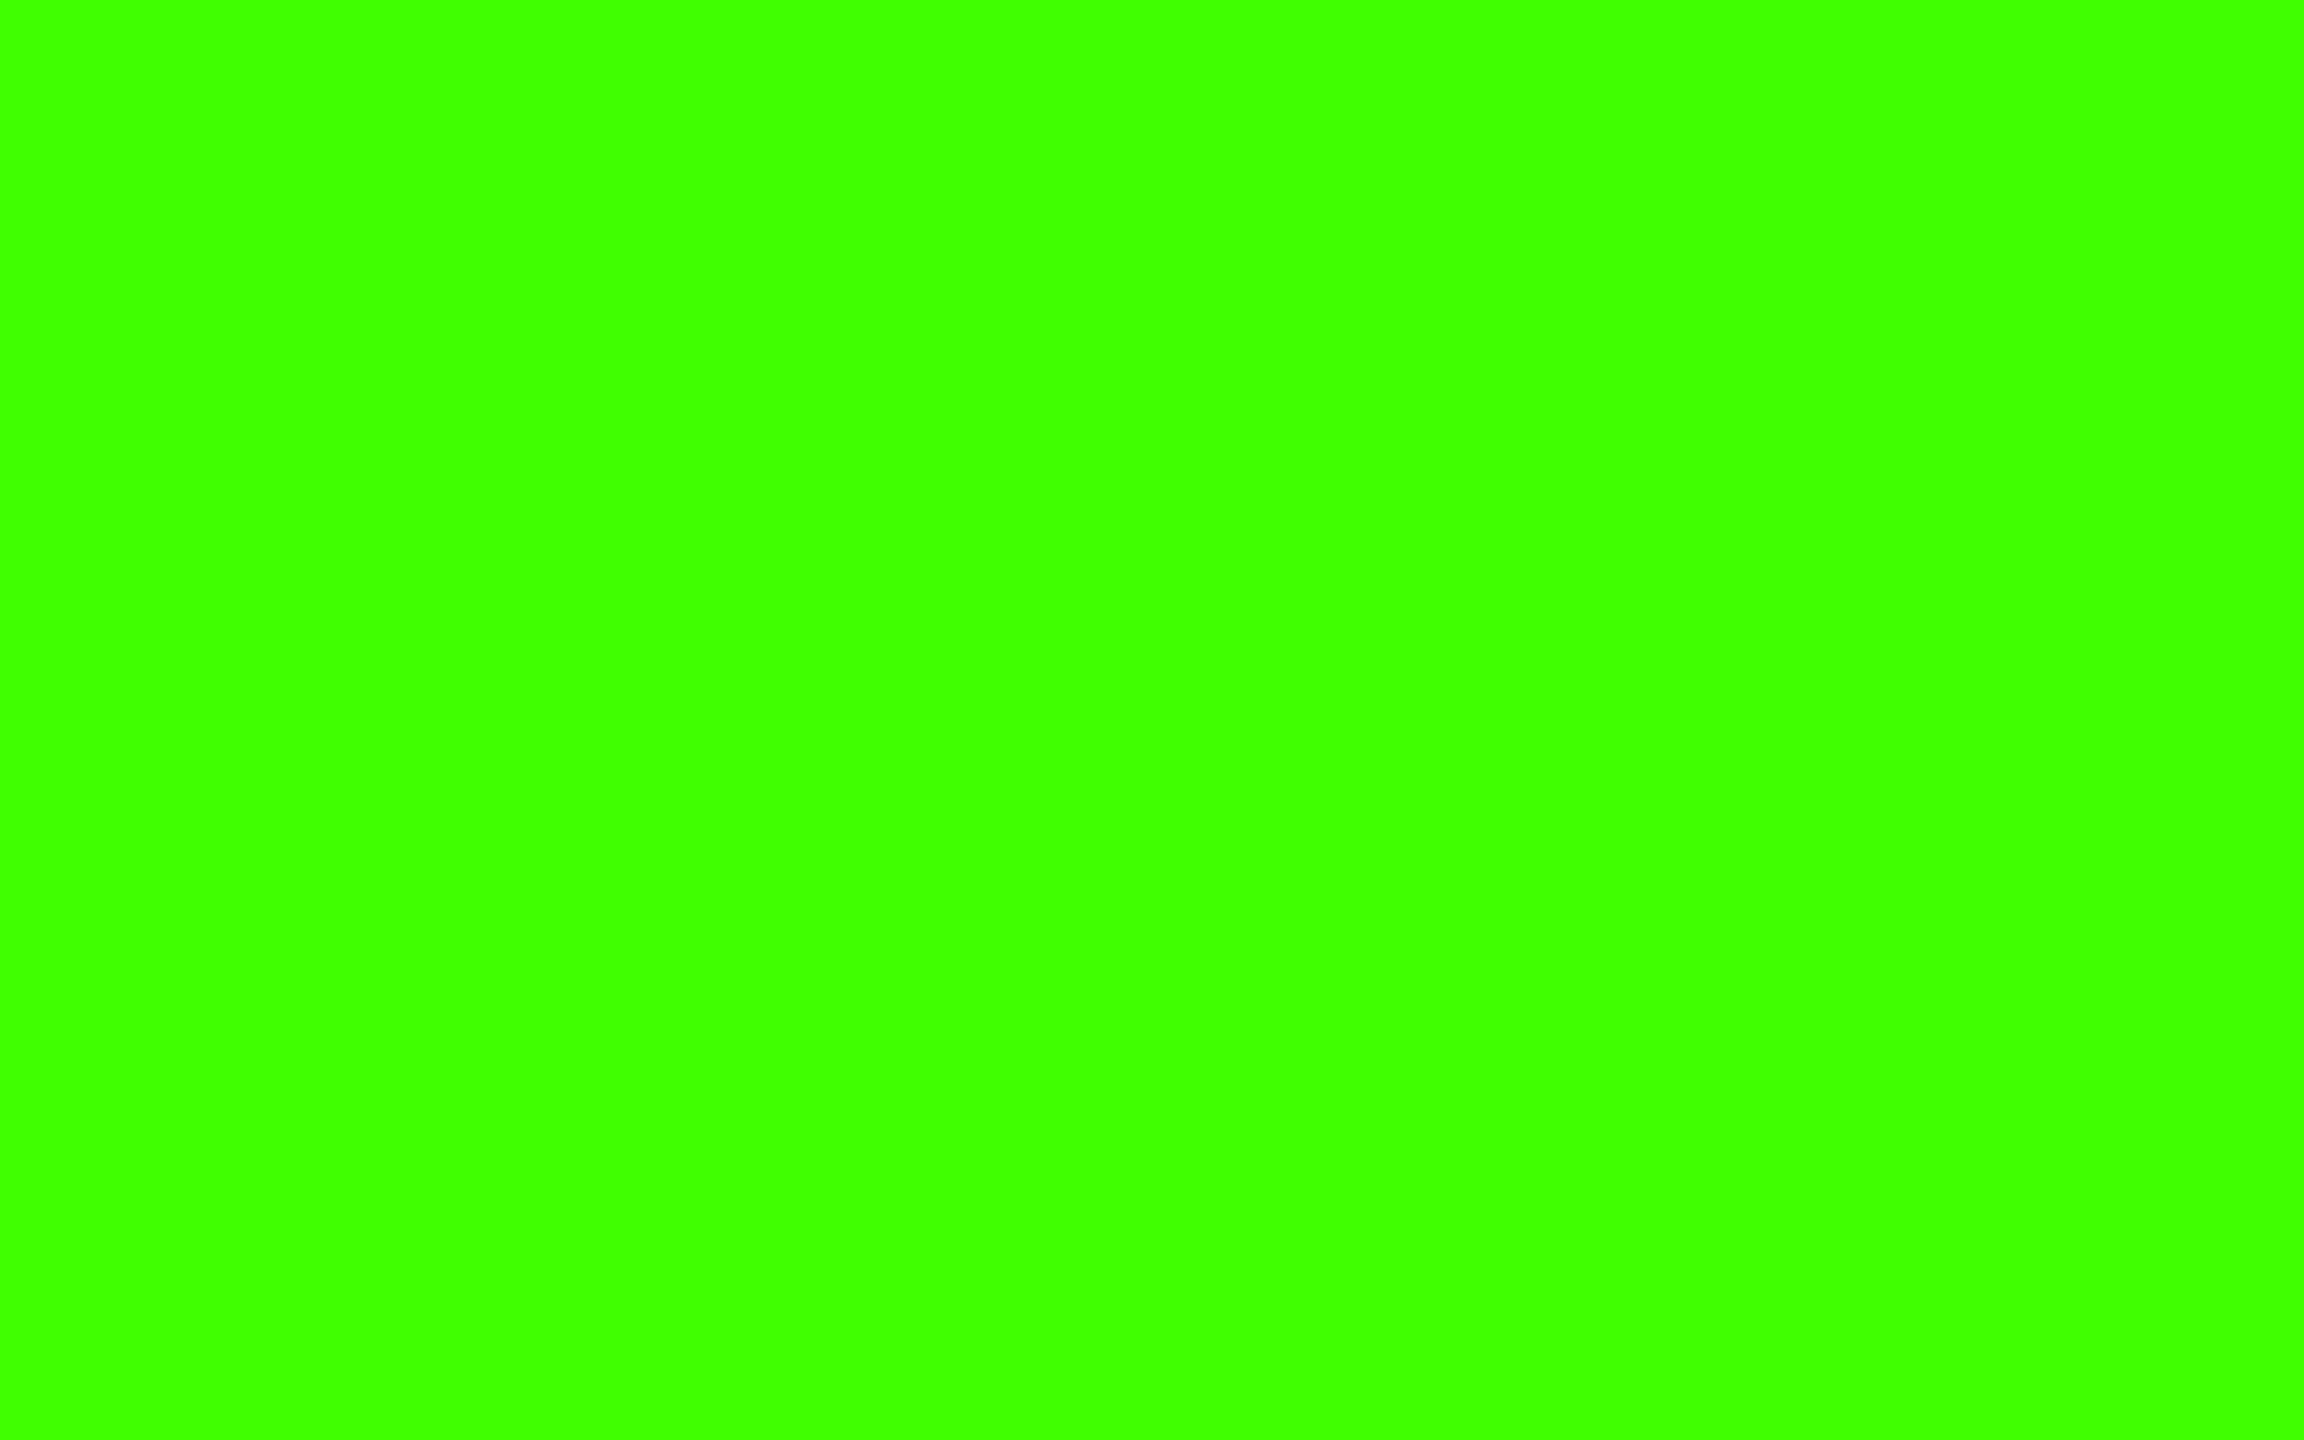 2304x1440 Harlequin Solid Color Background